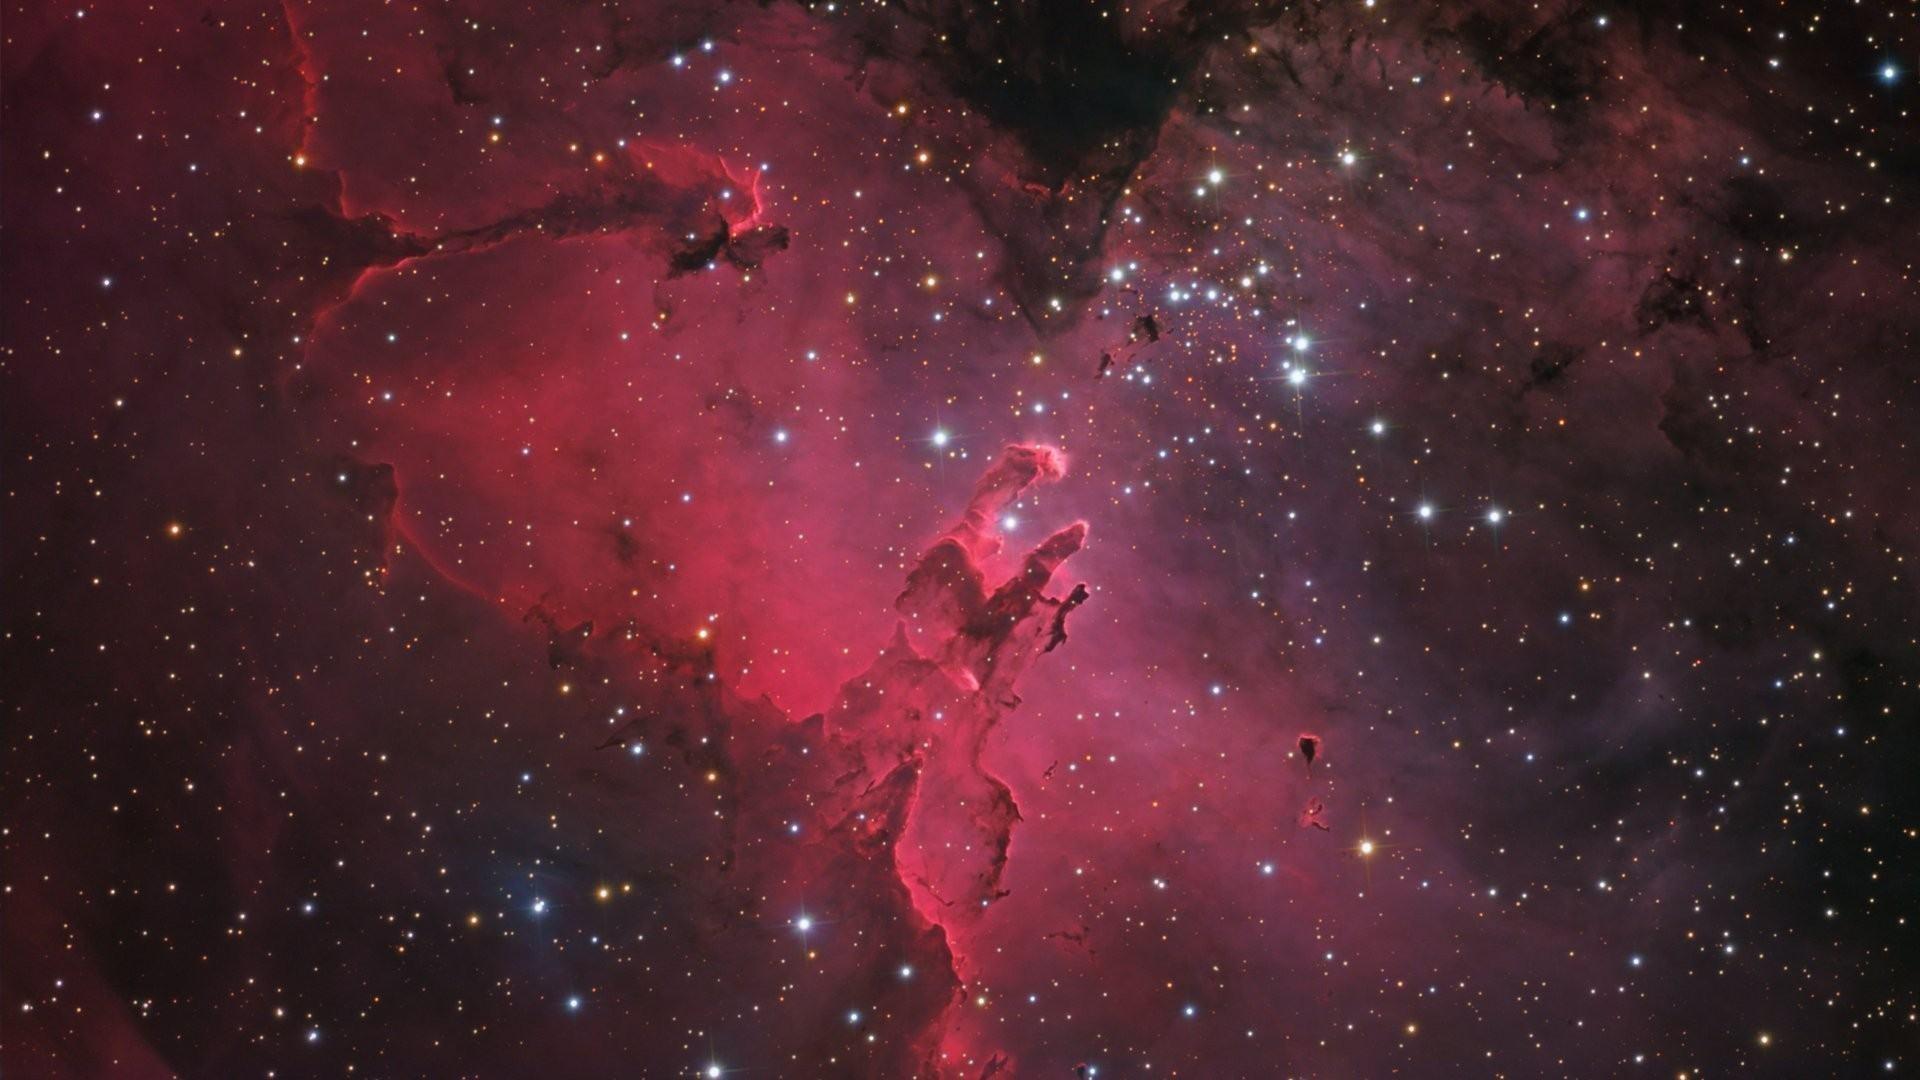 wallpaper.wiki-Hubble-HD-Picture-1920×1080-PIC-WPD002249